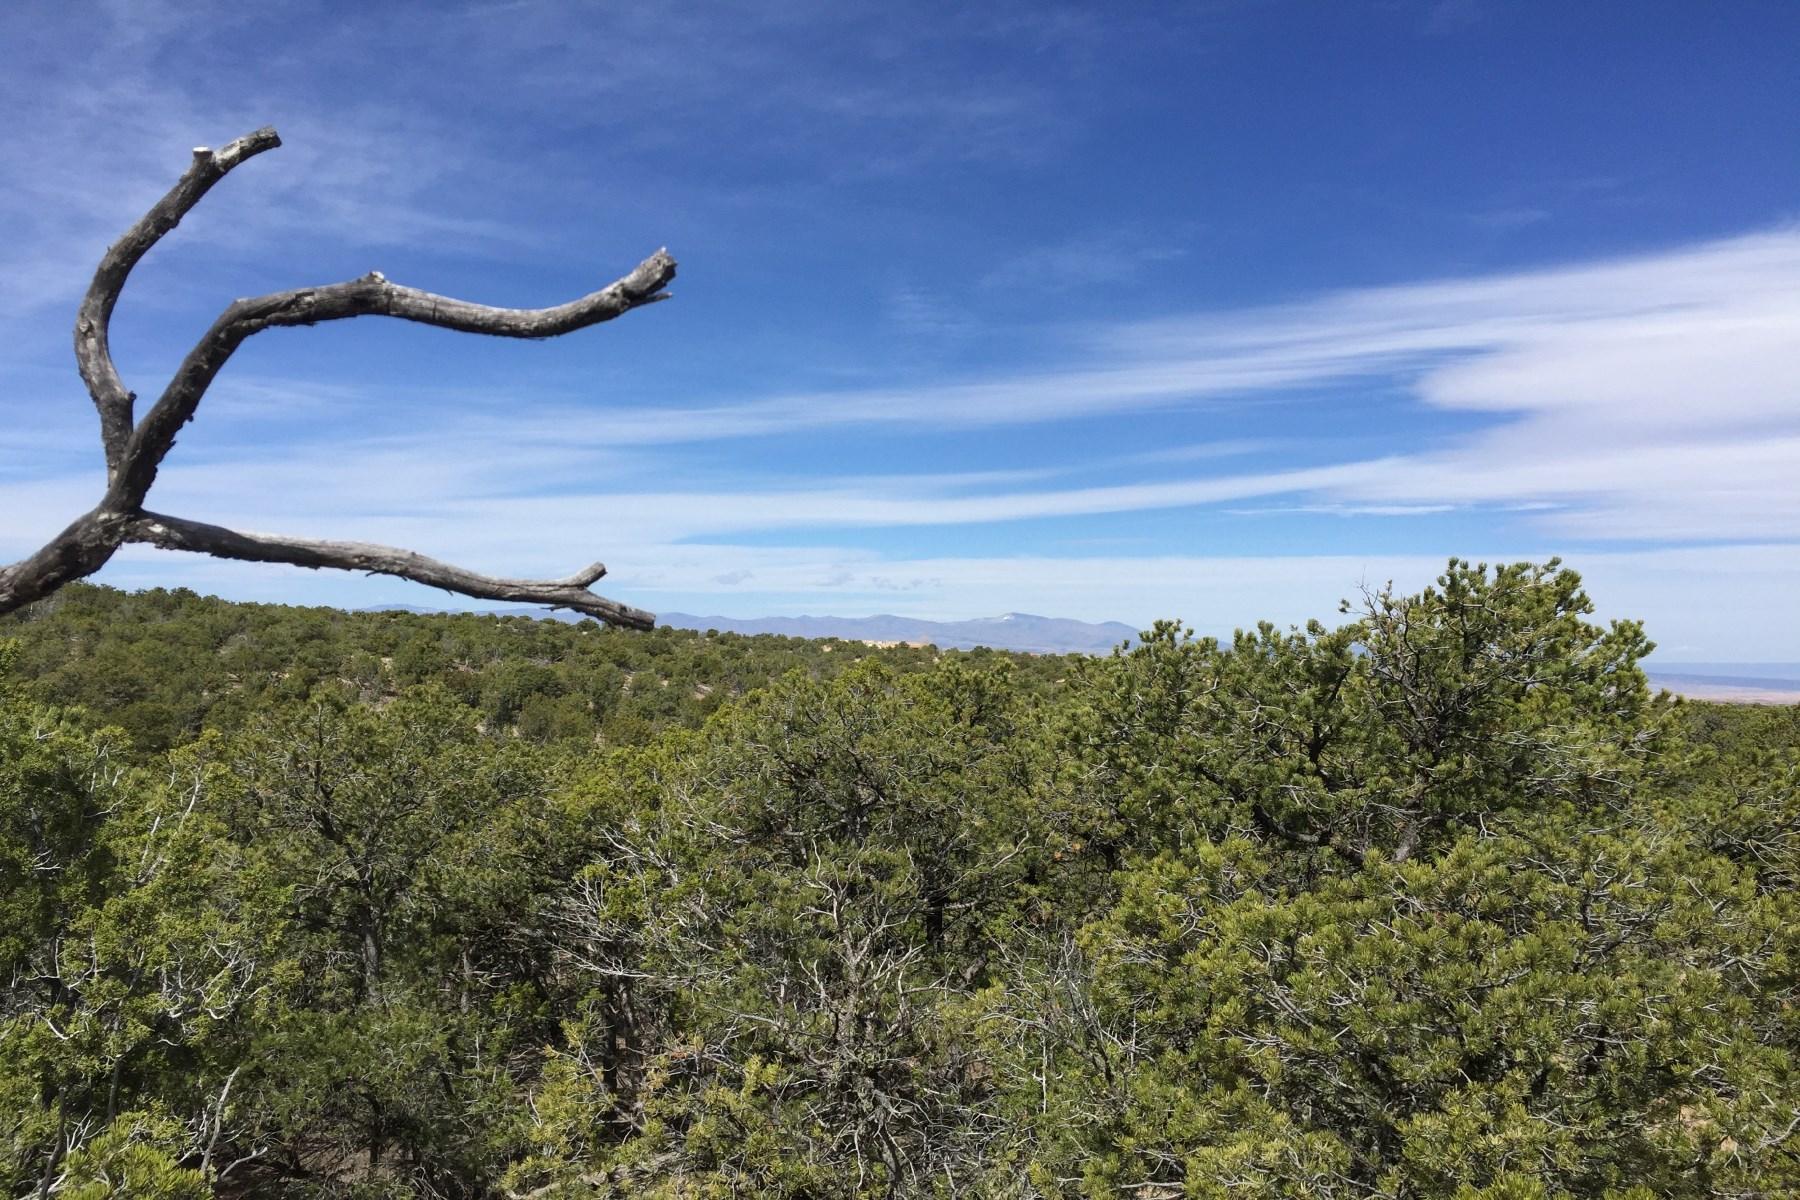 Land for Sale at 324 Pawprint - Lot 135 324 Pawprint Trail Monte Sereno, Santa Fe, New Mexico 87506 United States